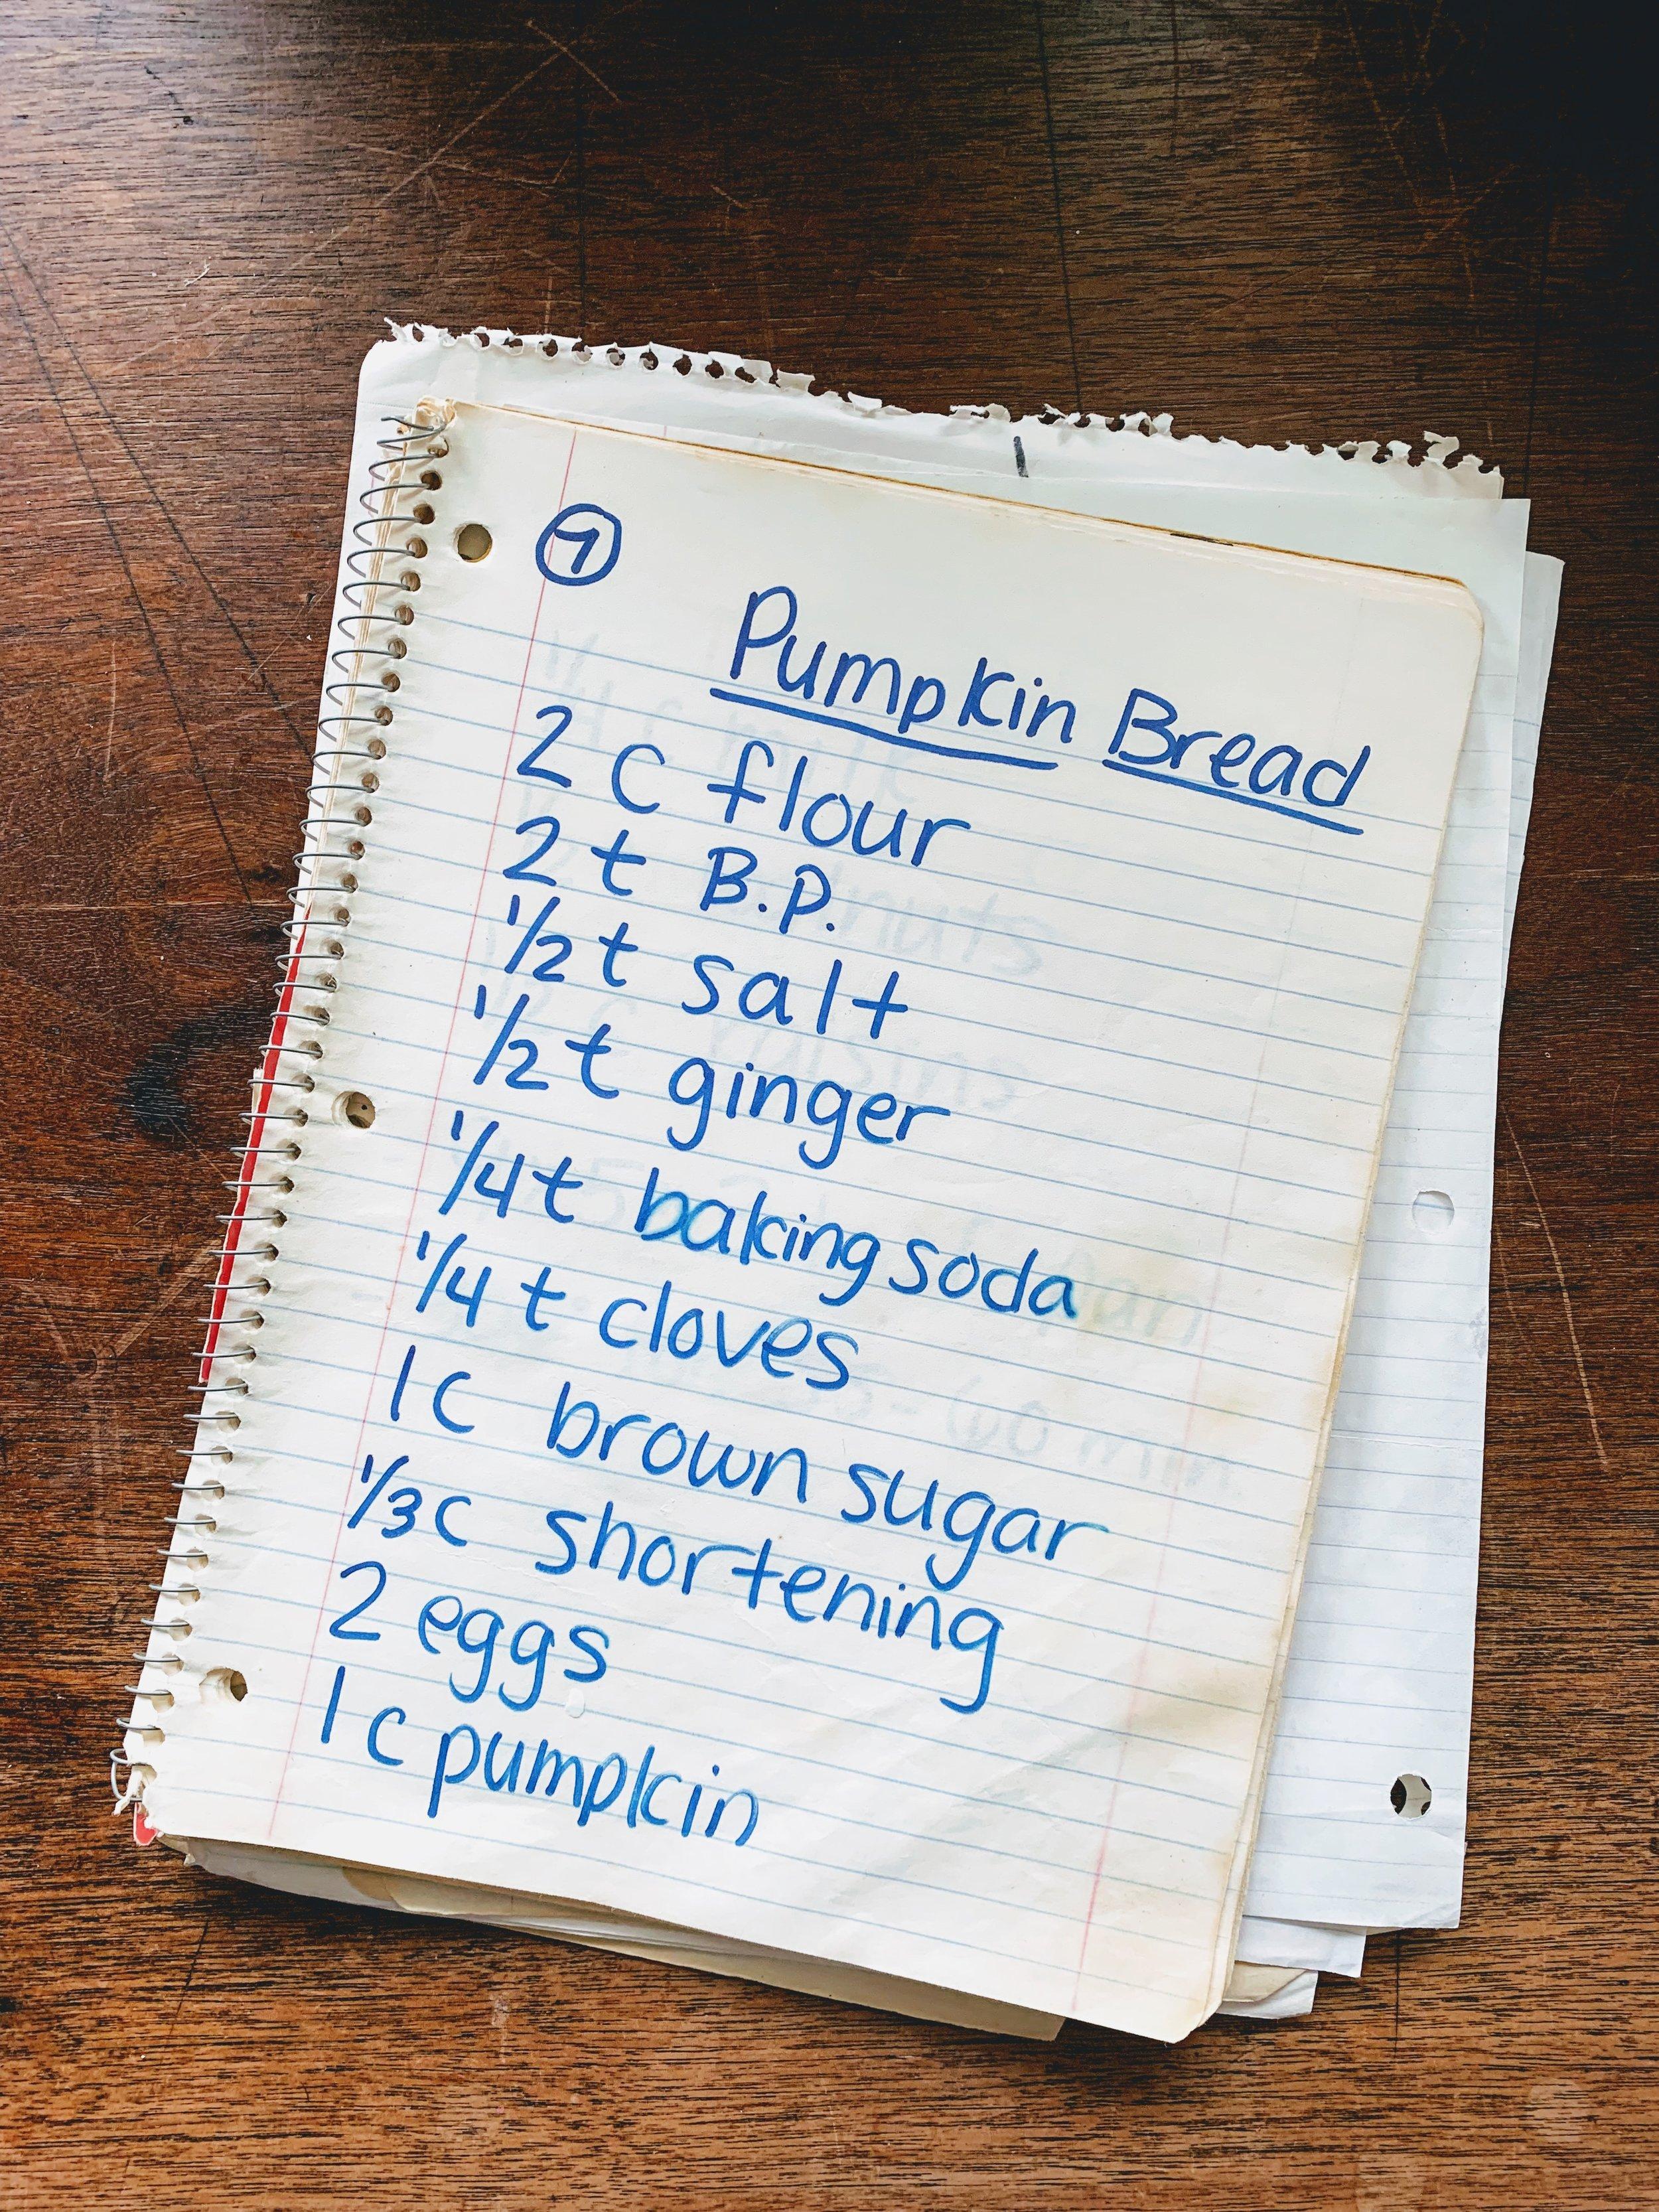 Gram's Souped-Up Pumpkin bread recipe book2.jpg